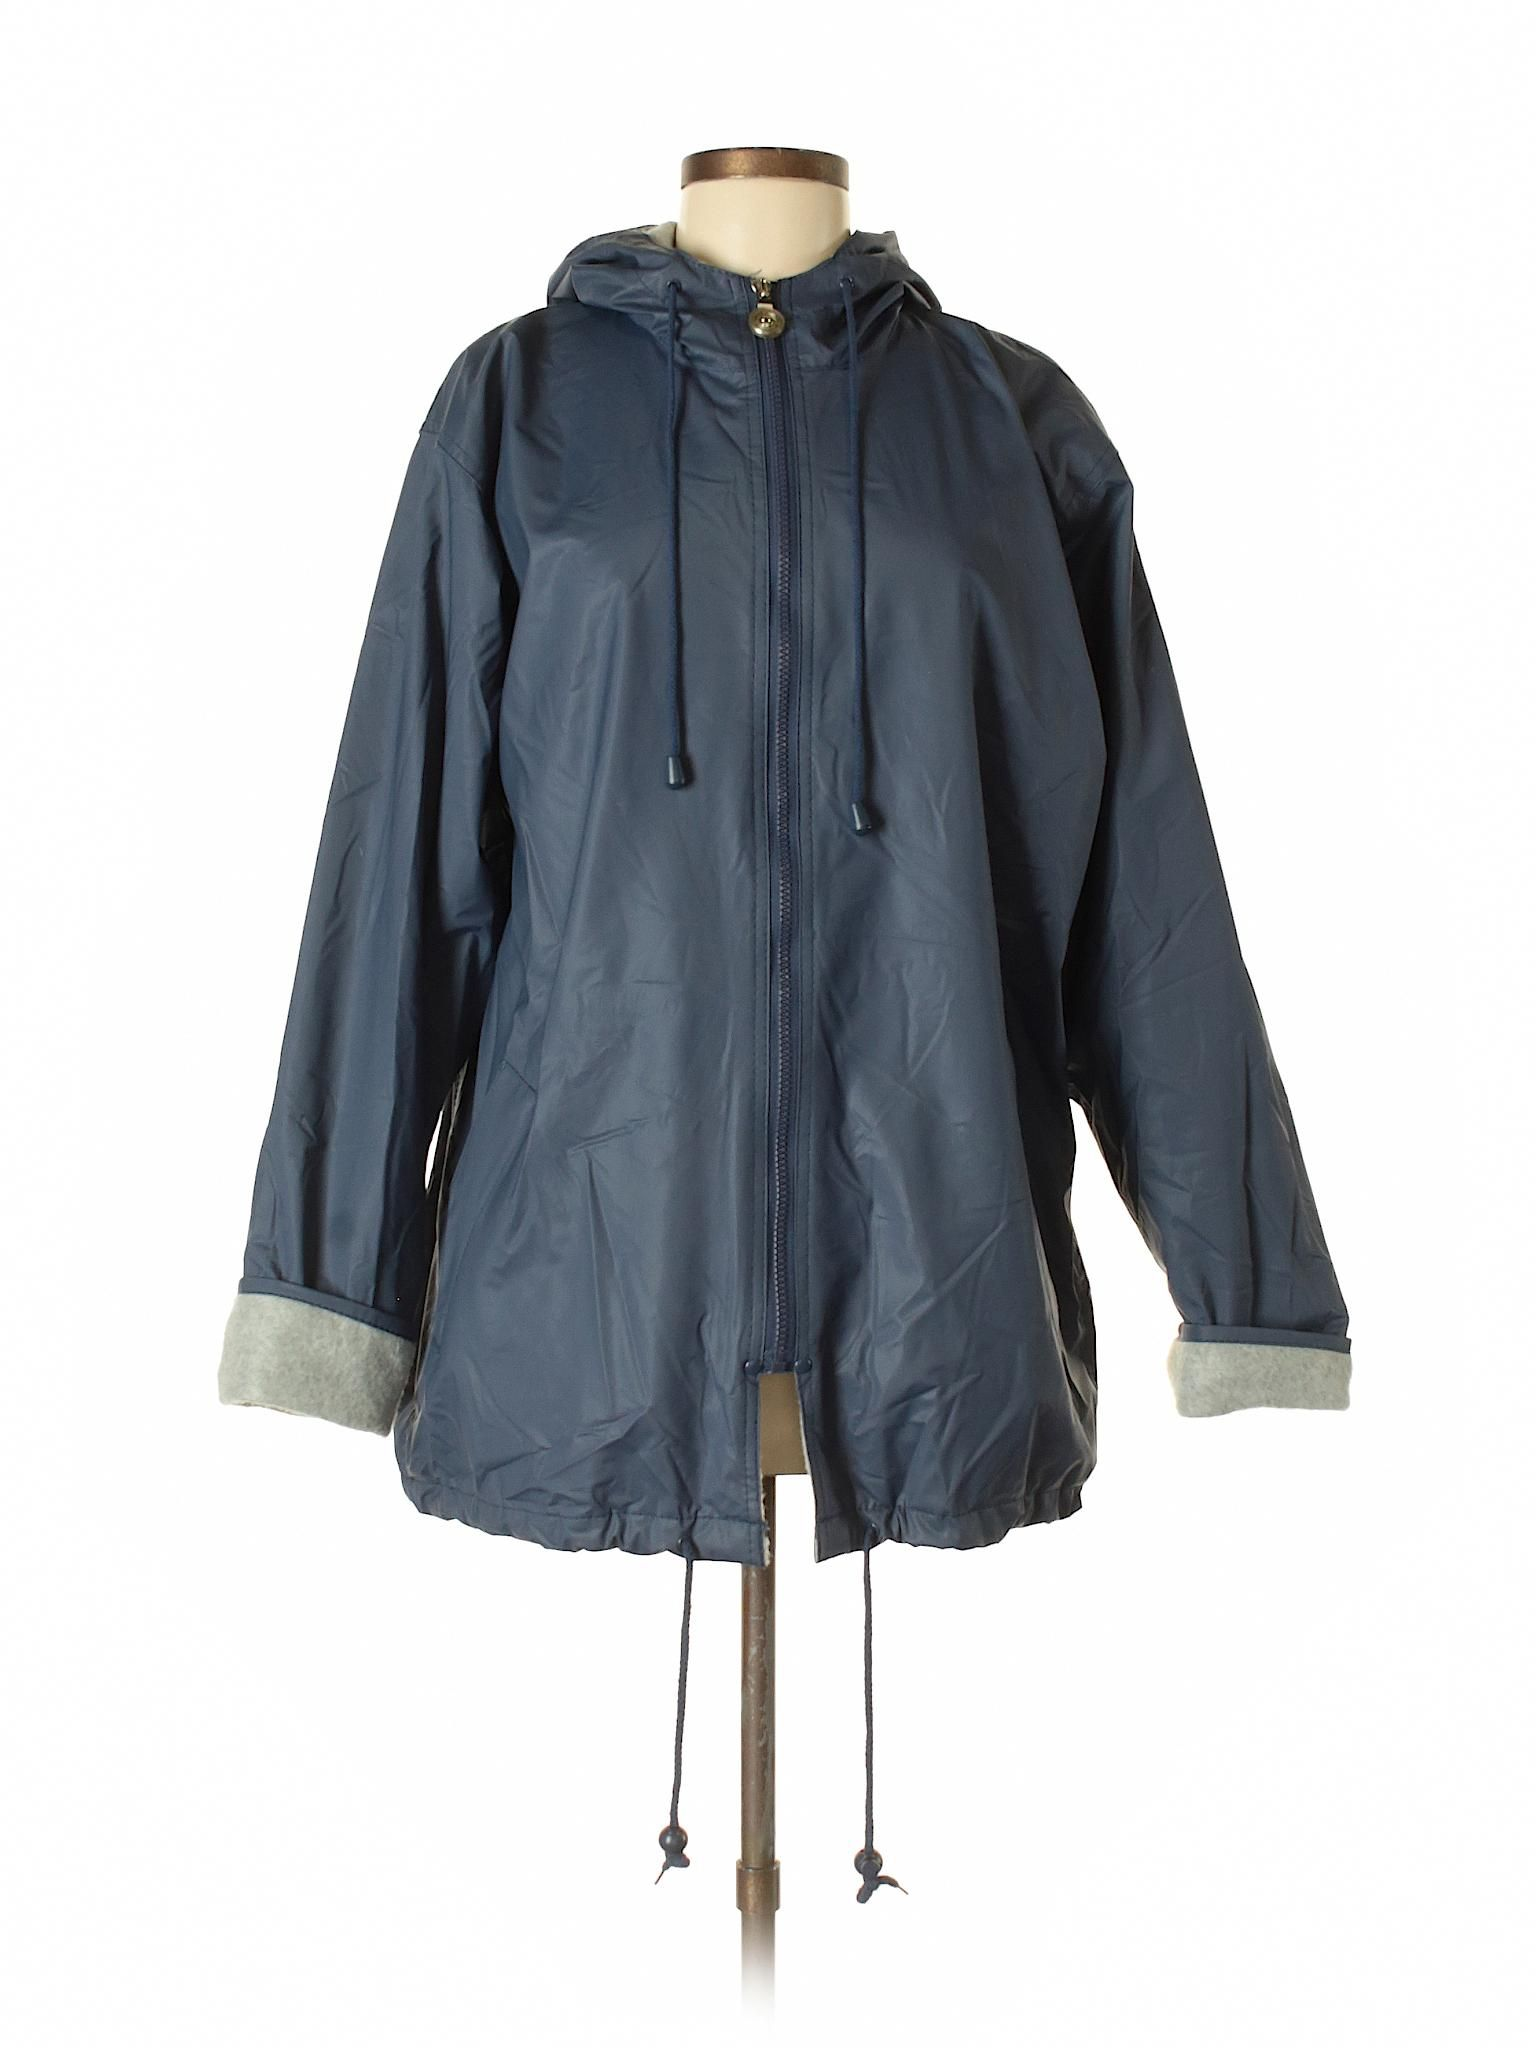 Talbots Raincoat Dark Blue Women S Jackets Outerwear 32363443 Rainjacketyouth Raincoats For Women Raincoat Talbots Raincoat [ 2048 x 1536 Pixel ]